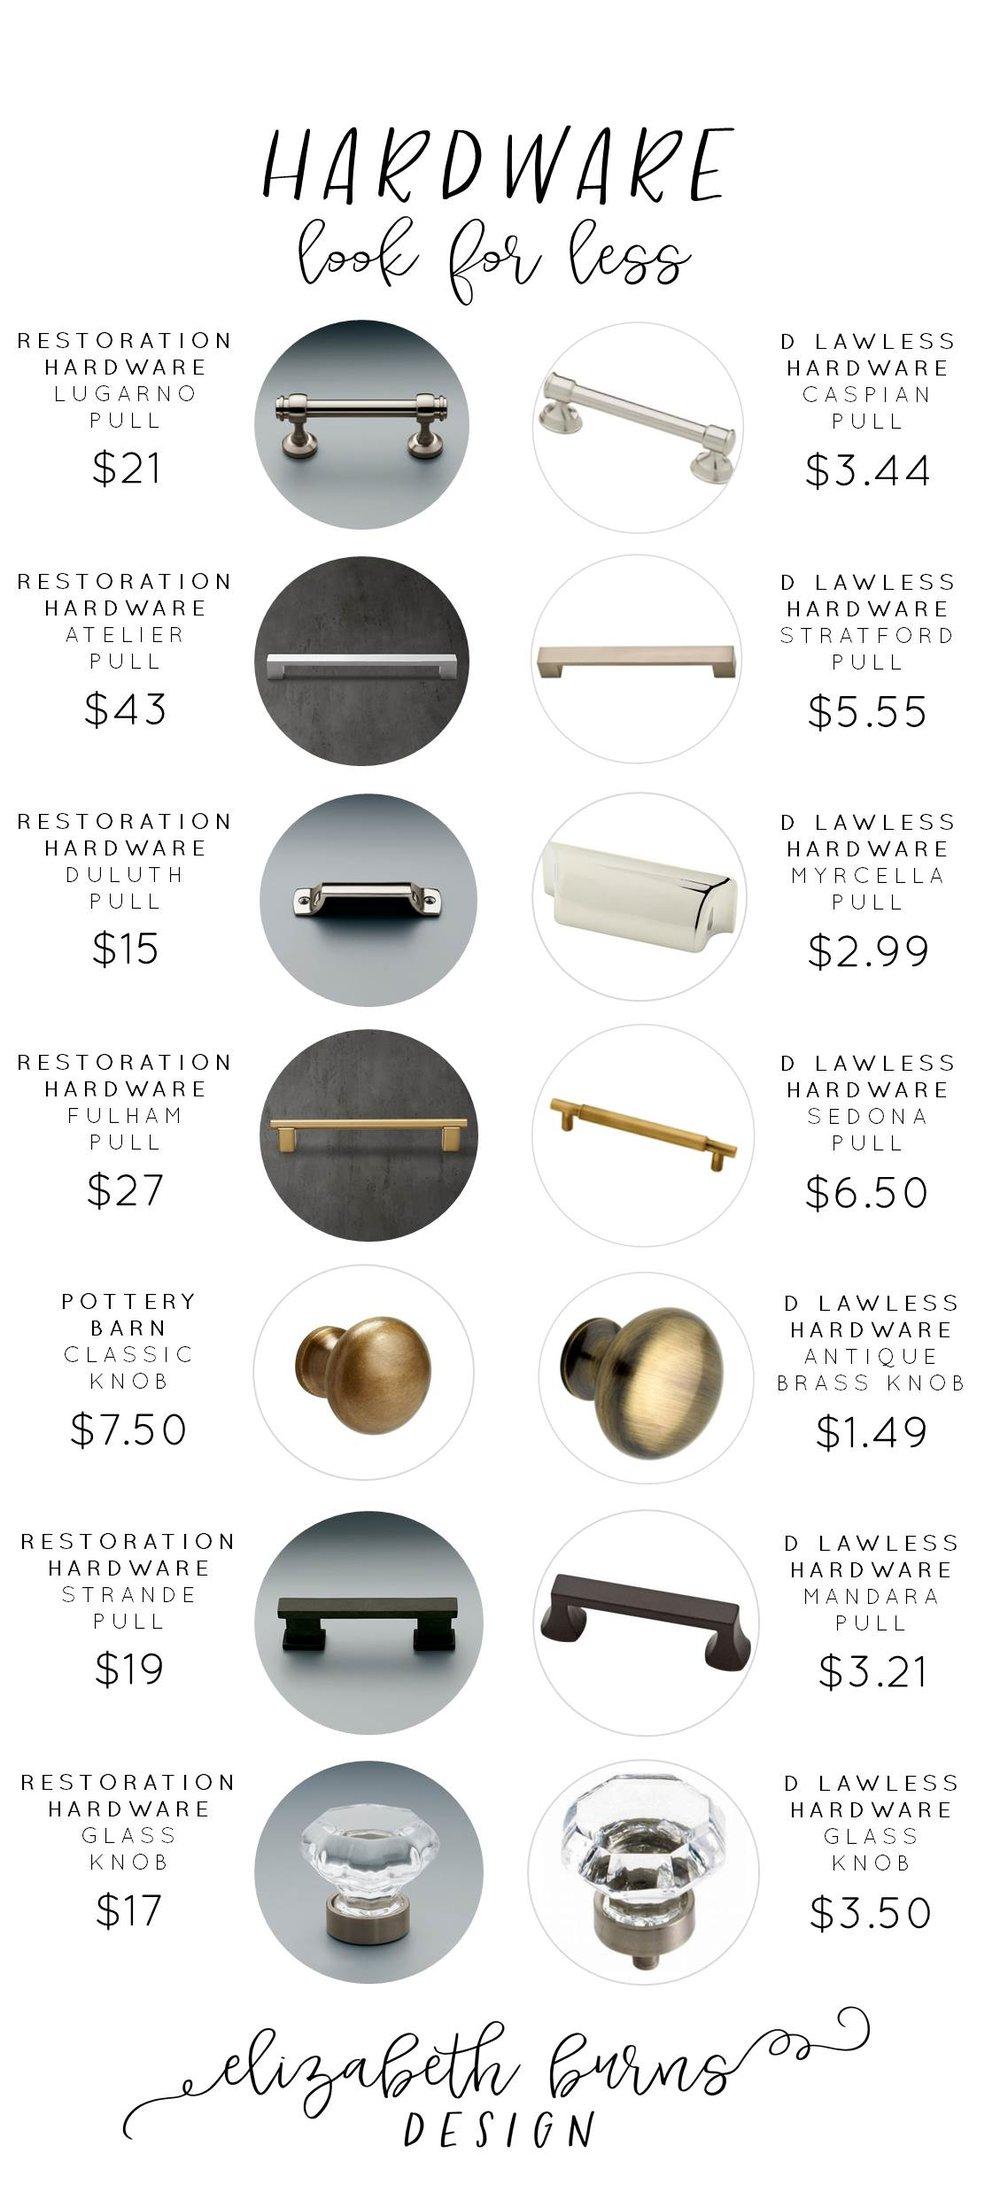 Elizabeth Burns Design | Raleigh Interior Designer - Affordable cabinet hardware for cheap kitchen renovation; look for less